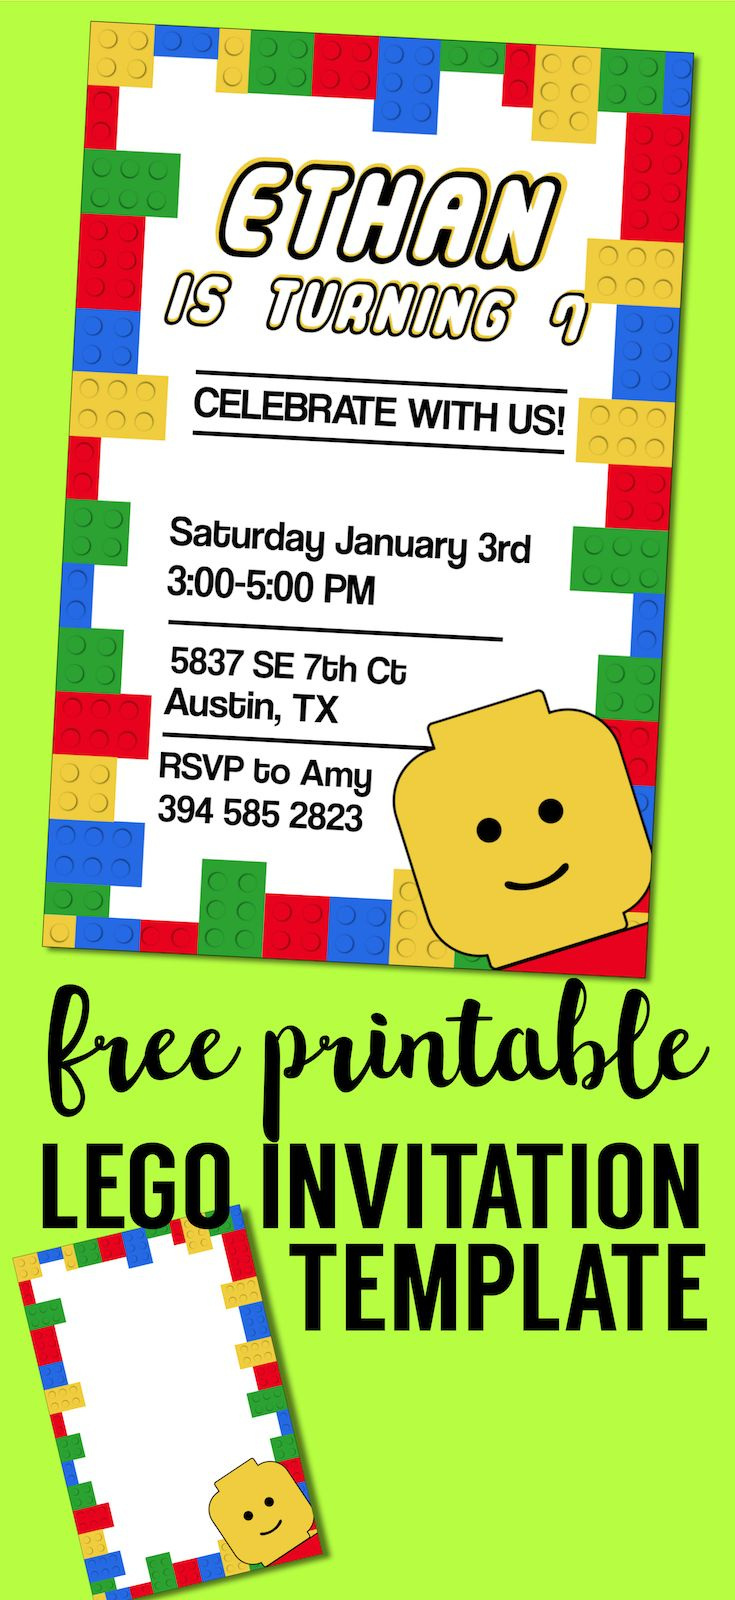 Free Printable Lego Birthday Party Invitation Template Lego Party